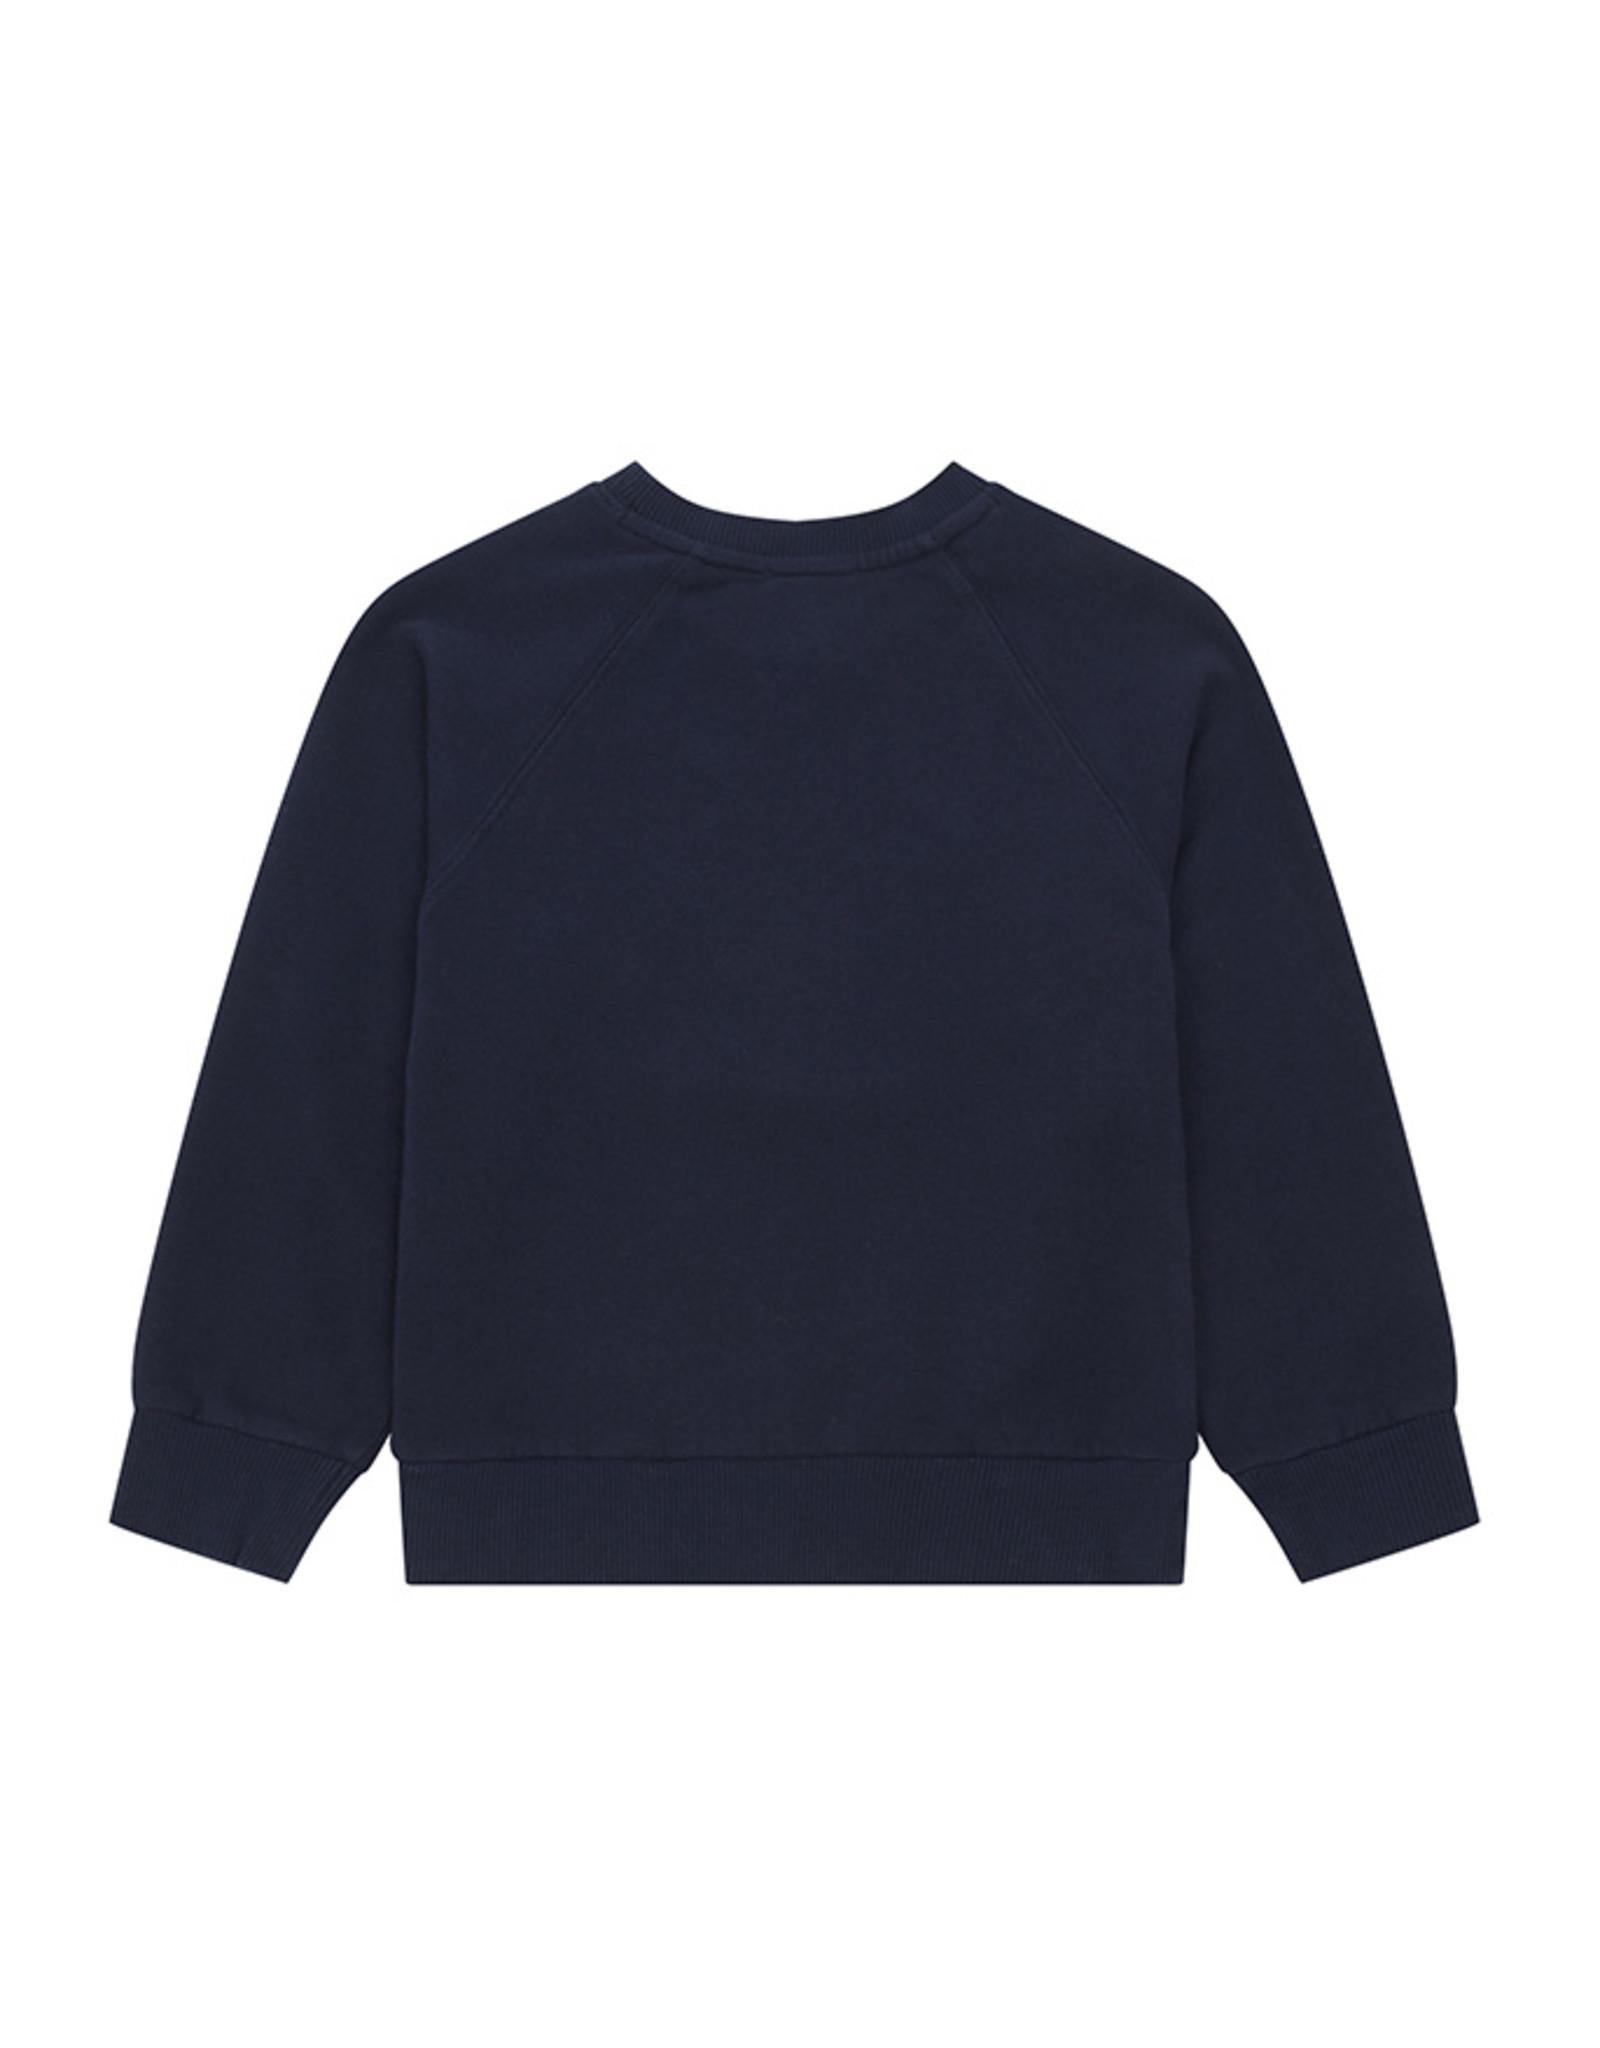 Dutronic midnight Sweatshirt blue